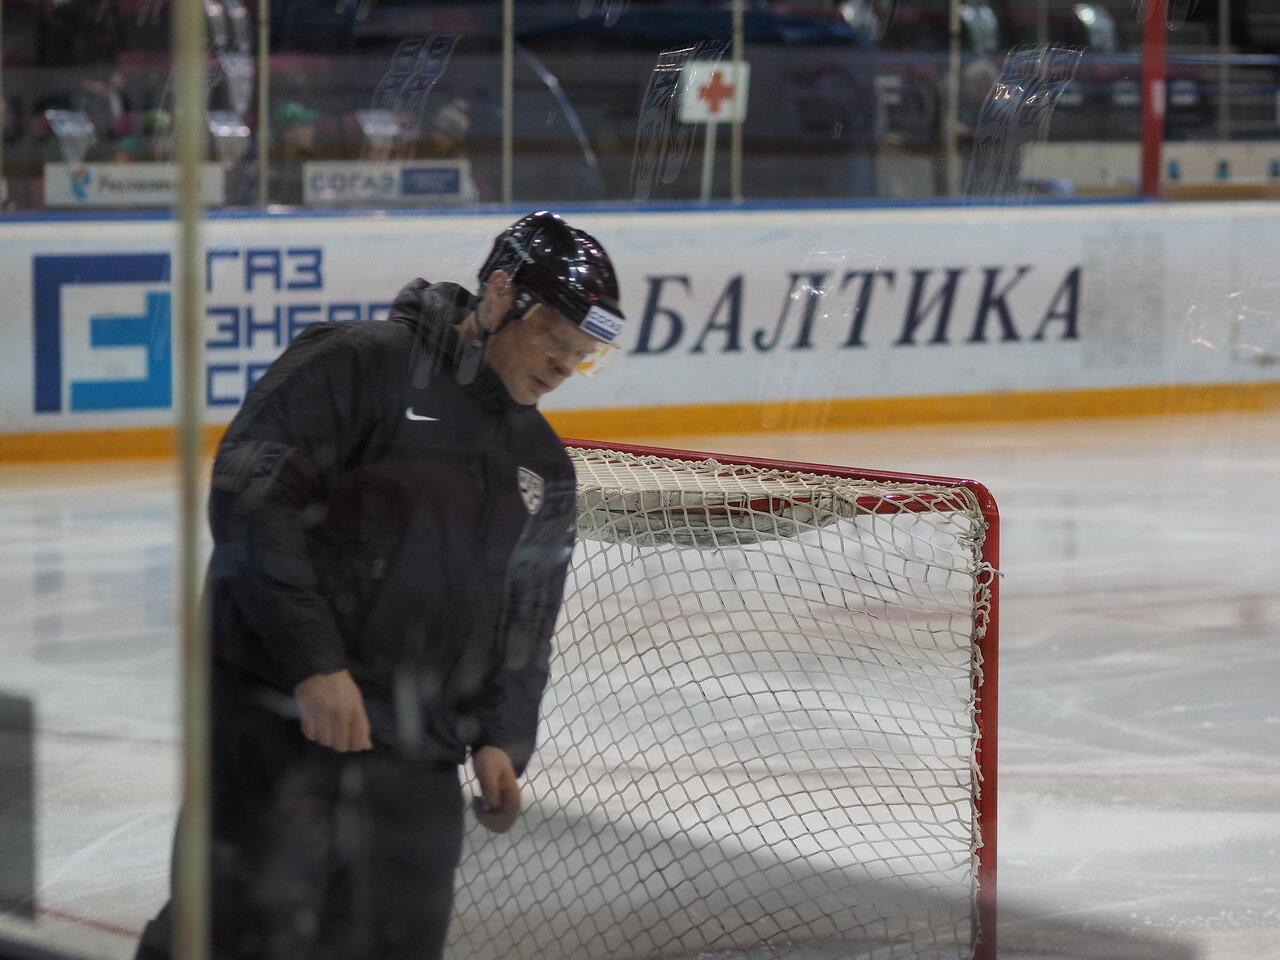 1Плей-офф 2016 Восток Финал Металлург - Салават Юлаев 23.03.2016